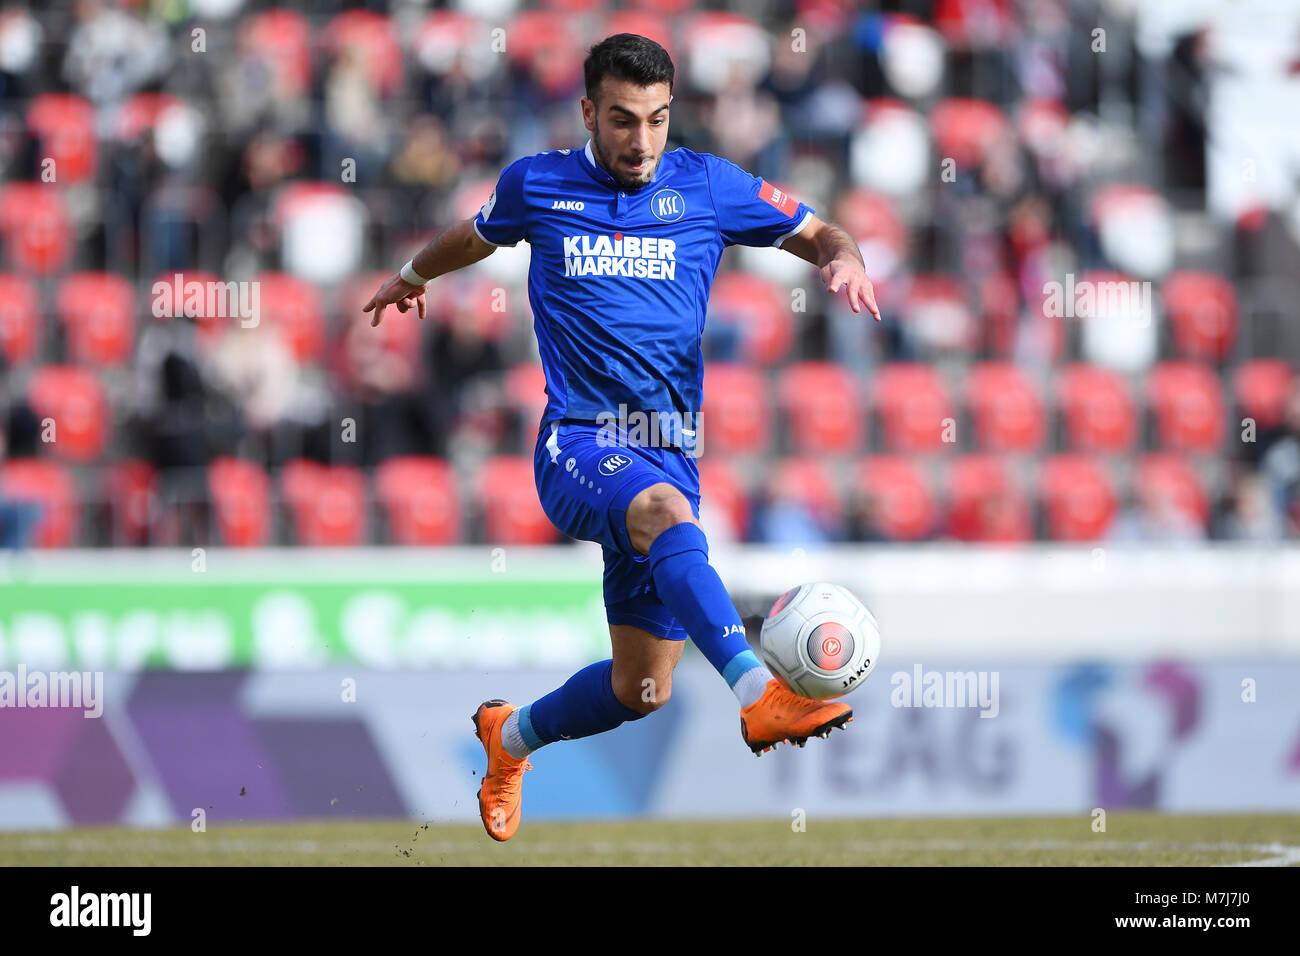 Burak Camoglu (KSC).  GES/ Fussball/ 3. Liga: RW Erfurt - Karlsruher SC, 11.03.2018  Football / Soccer: 3rd League: Stock Photo